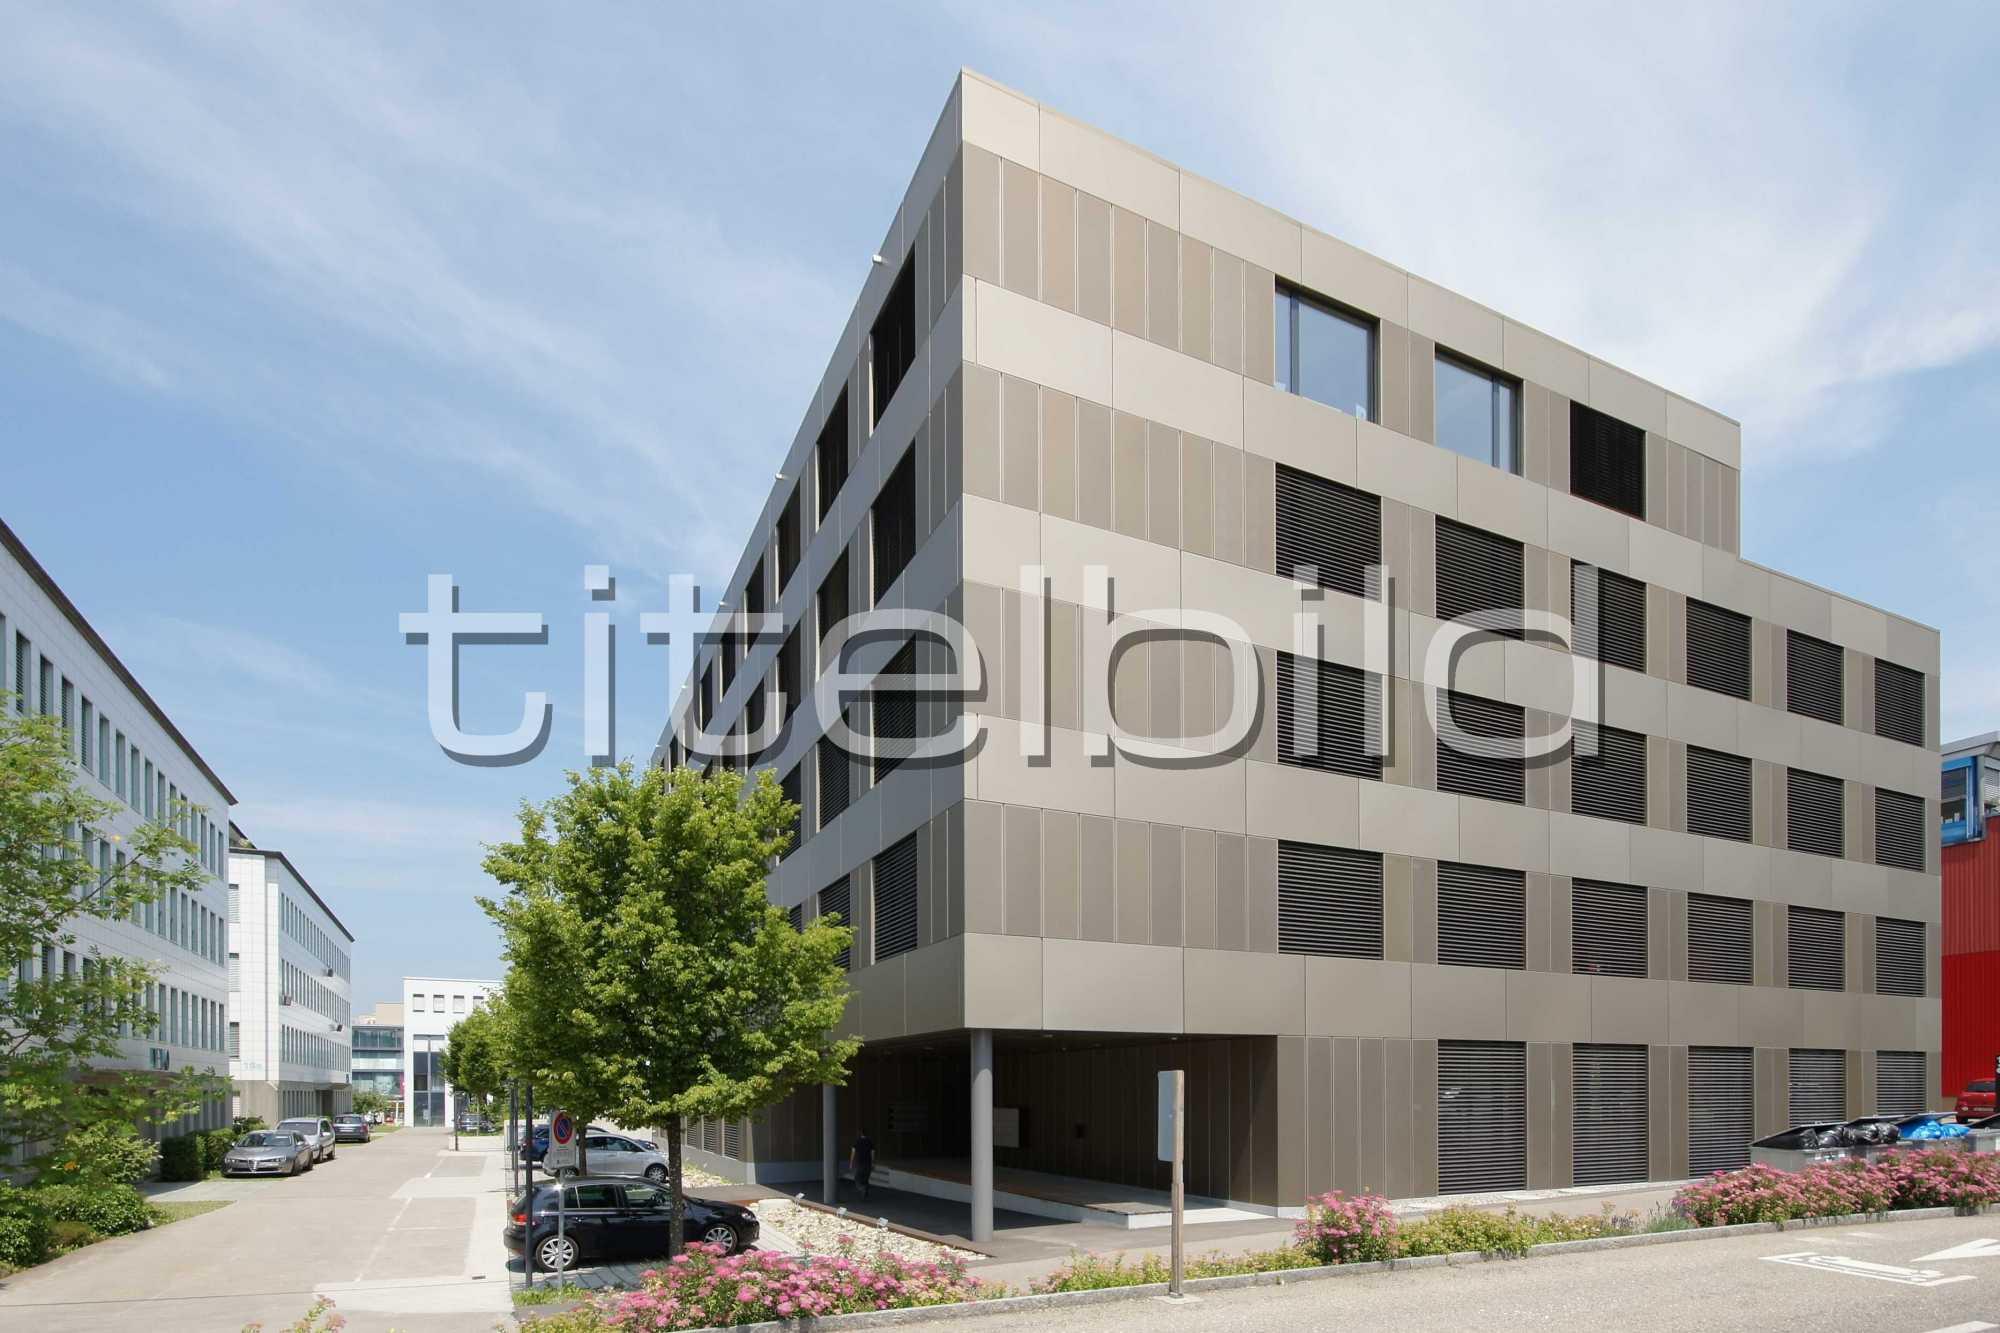 Projektbild-Nr. 2: Geschäftshaus esprit - baden